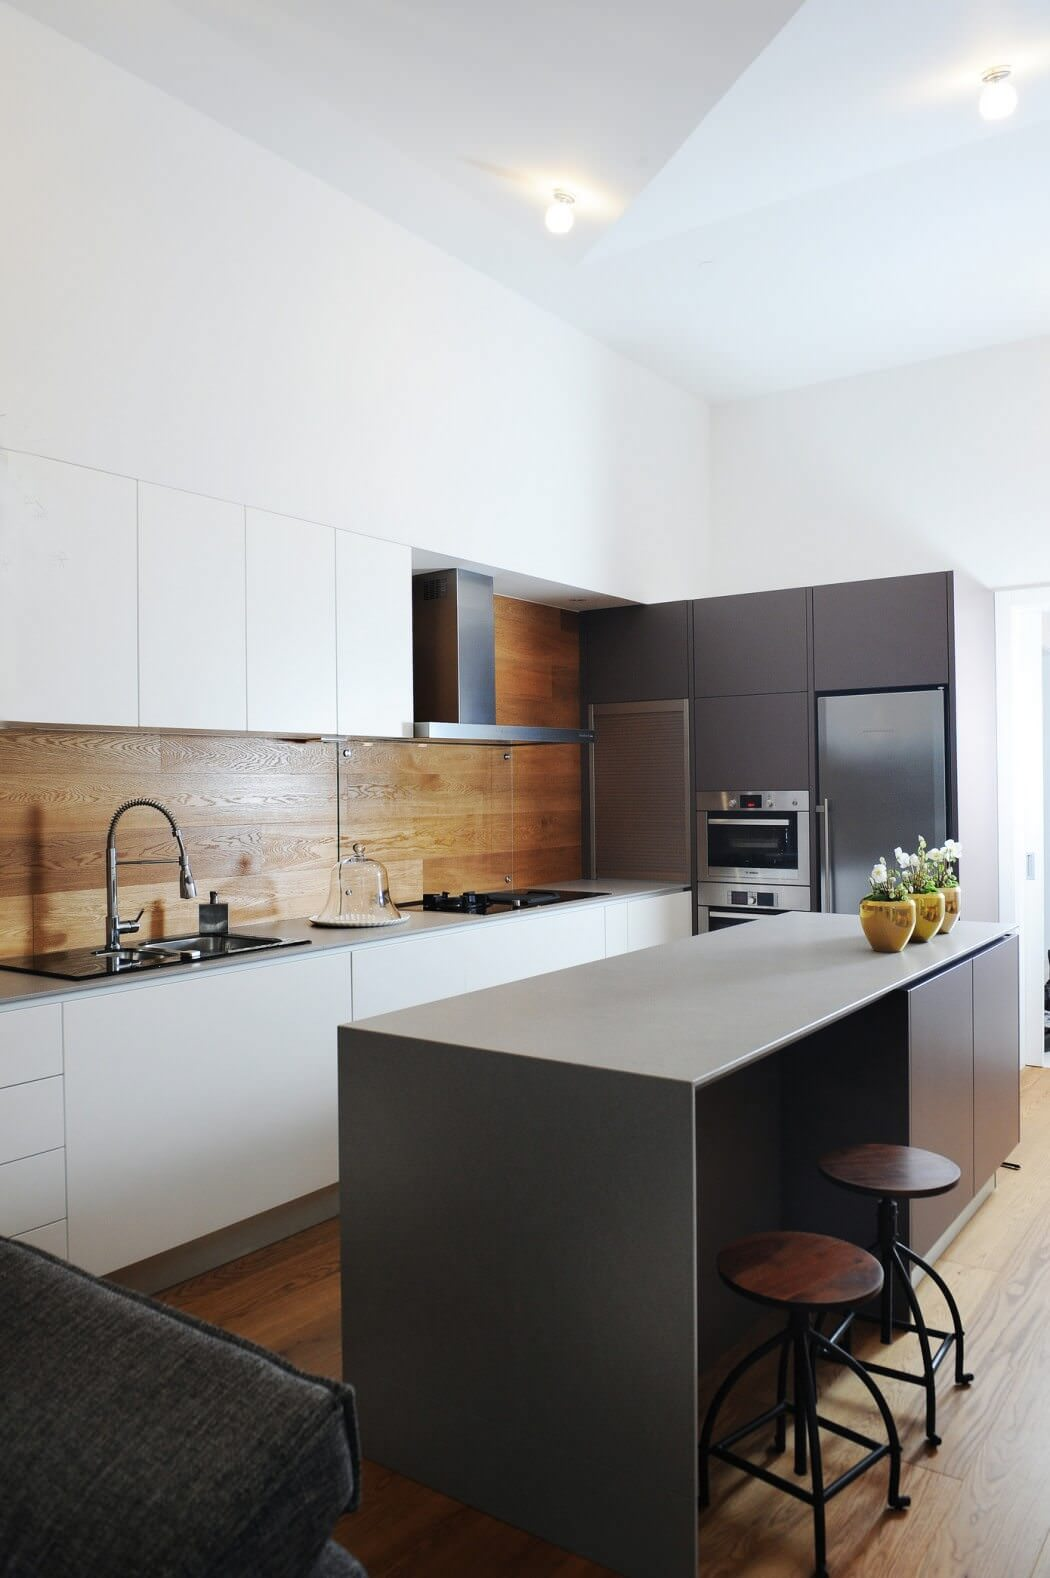 Beautiful Cucine Moderne Nere Images - Comads897.com - comads897.com